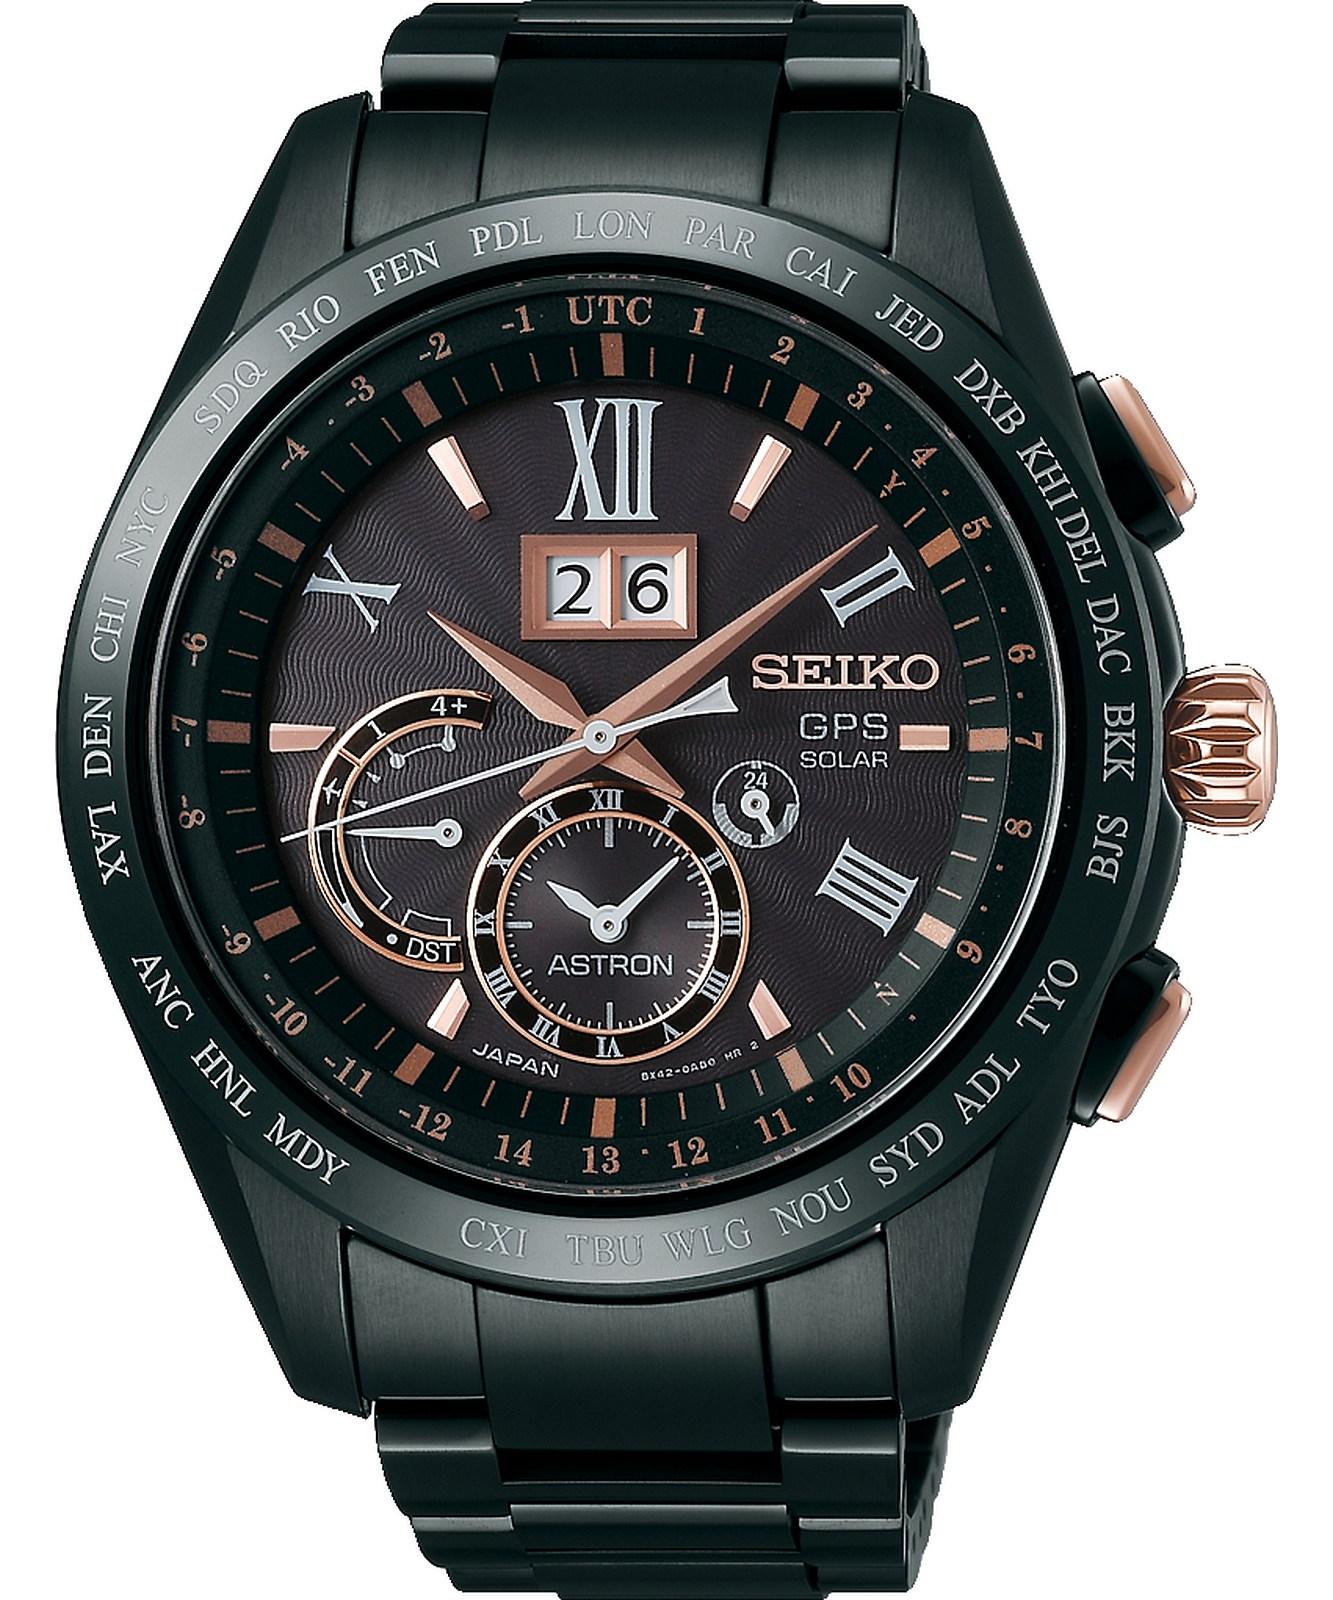 Zegarek męski Seiko Astron GPS Solar Titanium Perpetual Calendar SSE141J1